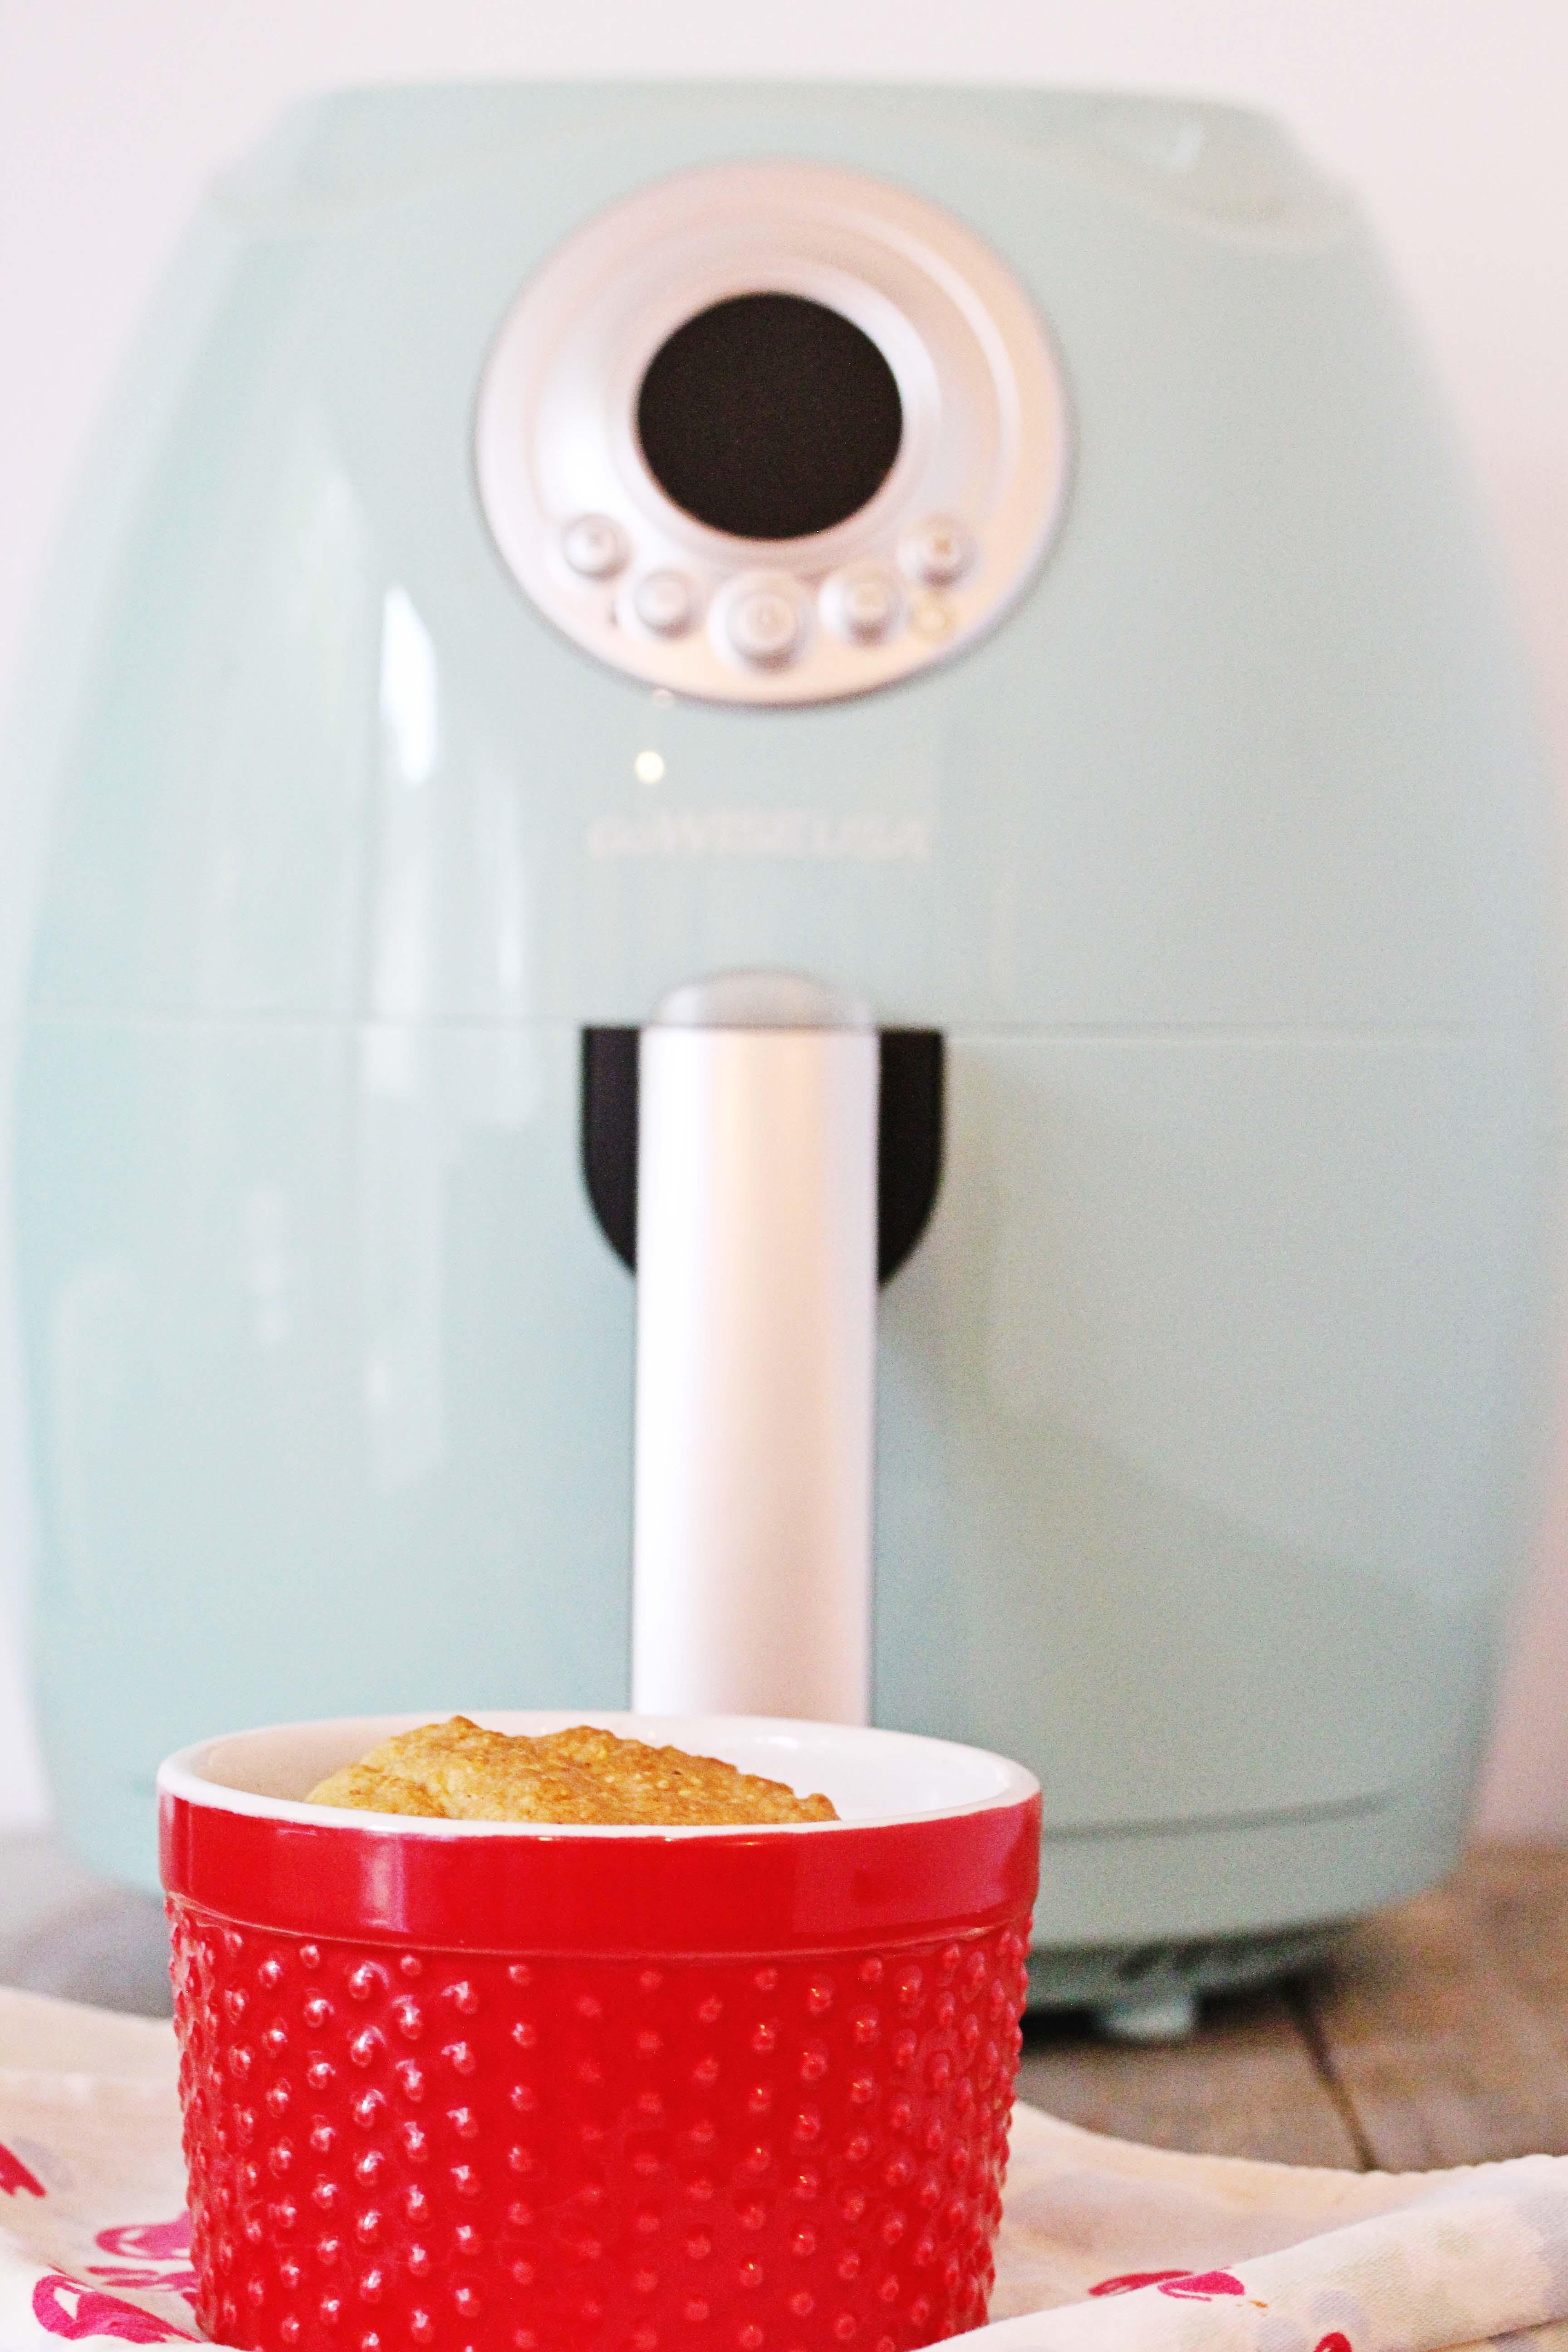 A Photo Of Air Fryer Sweet Rosemary Cornbread Gluten-Free + Vegan | Julie's Kitchenette